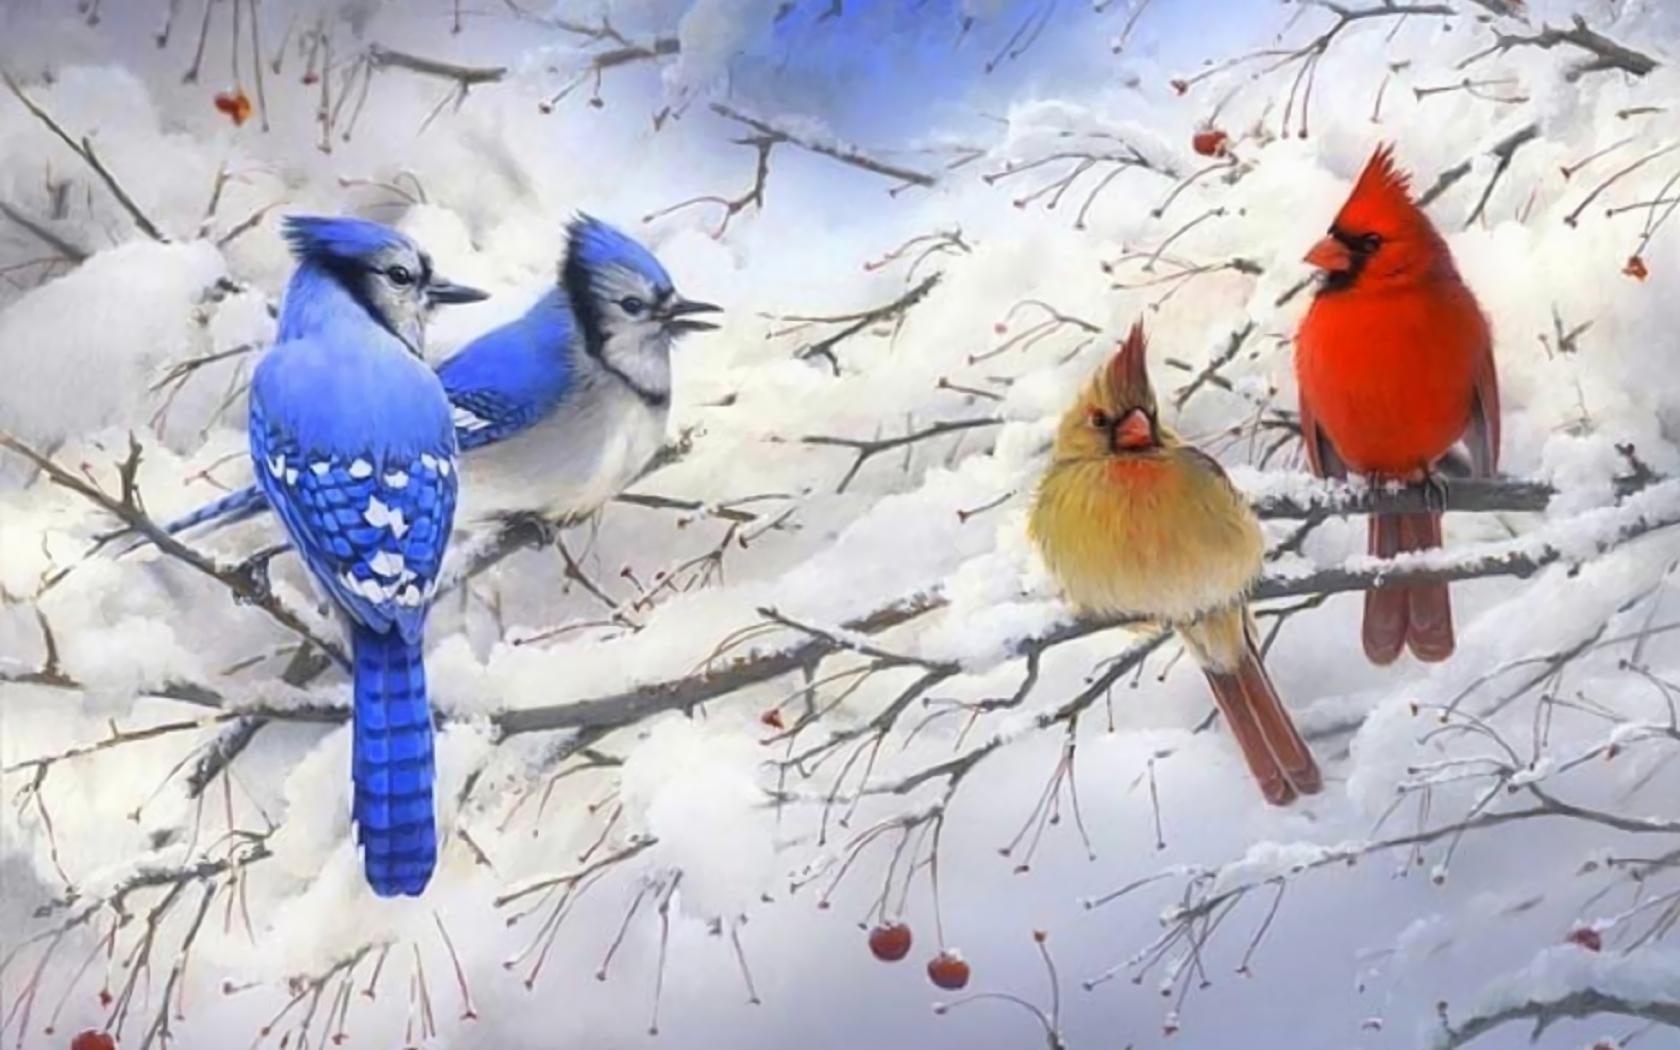 The Blue Jay Wallpaper Birds Animals (78 Wallpapers) - 3D ...